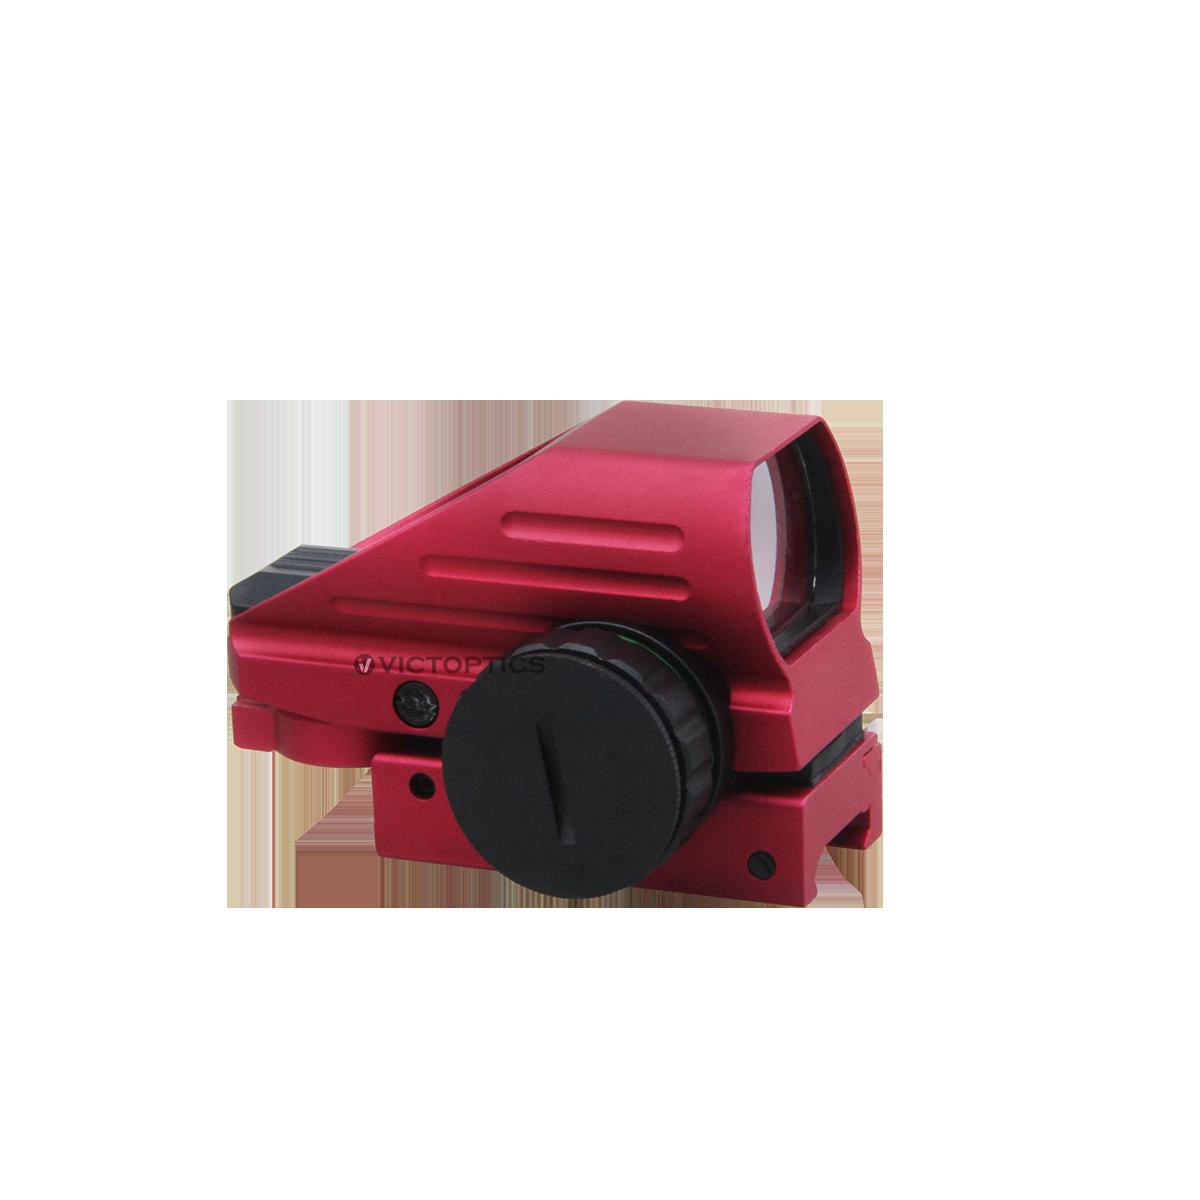 VictOptics Z3 1x22x33 Red Dot Sight Red Finish